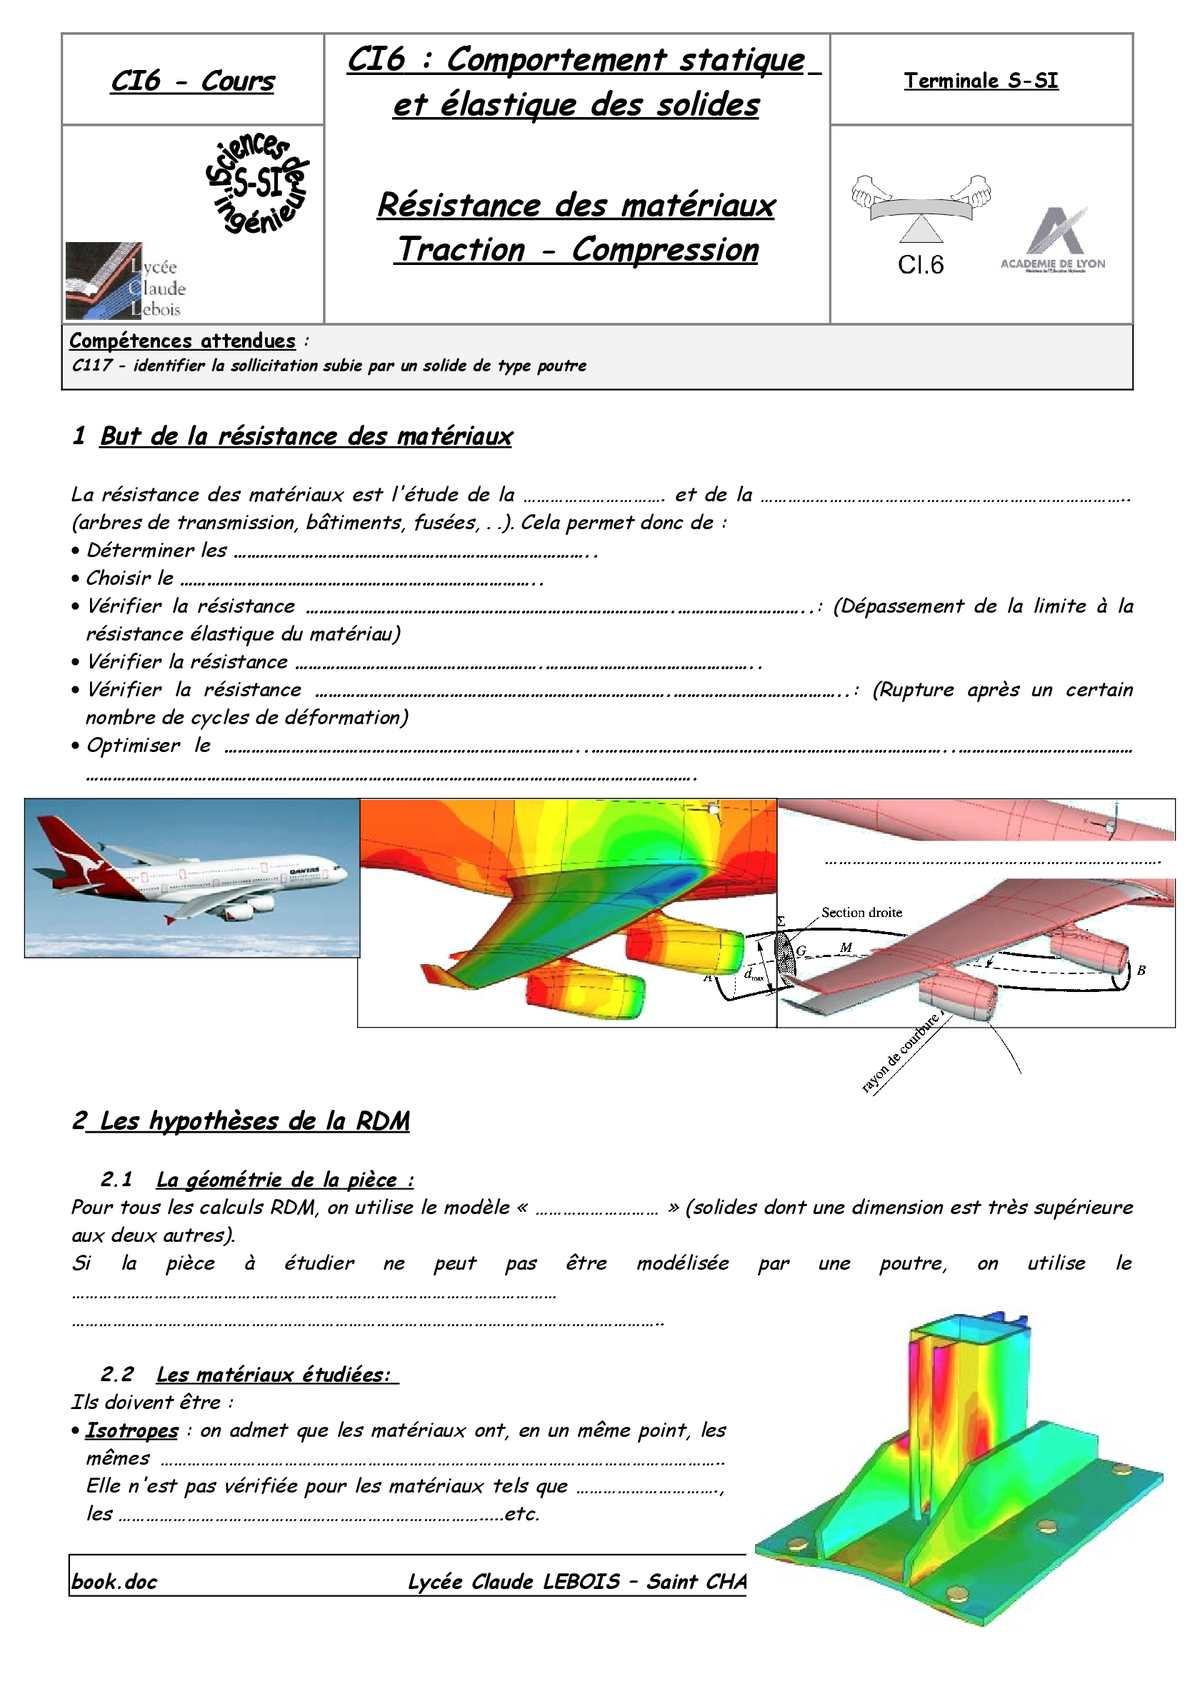 Calaméo - Cours RDM traction compression